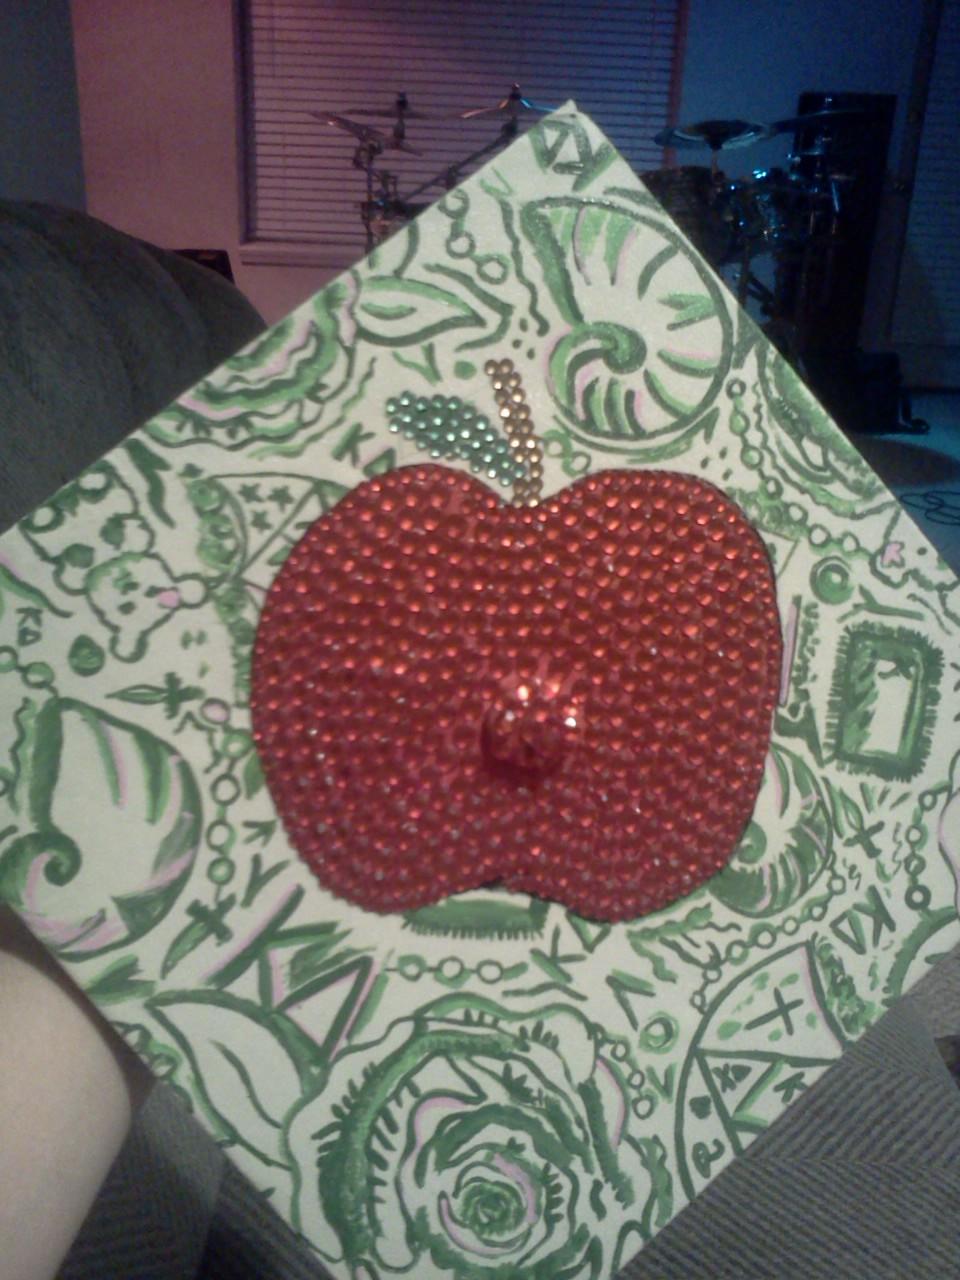 Representing my sorority and my career on my cap. TSM.